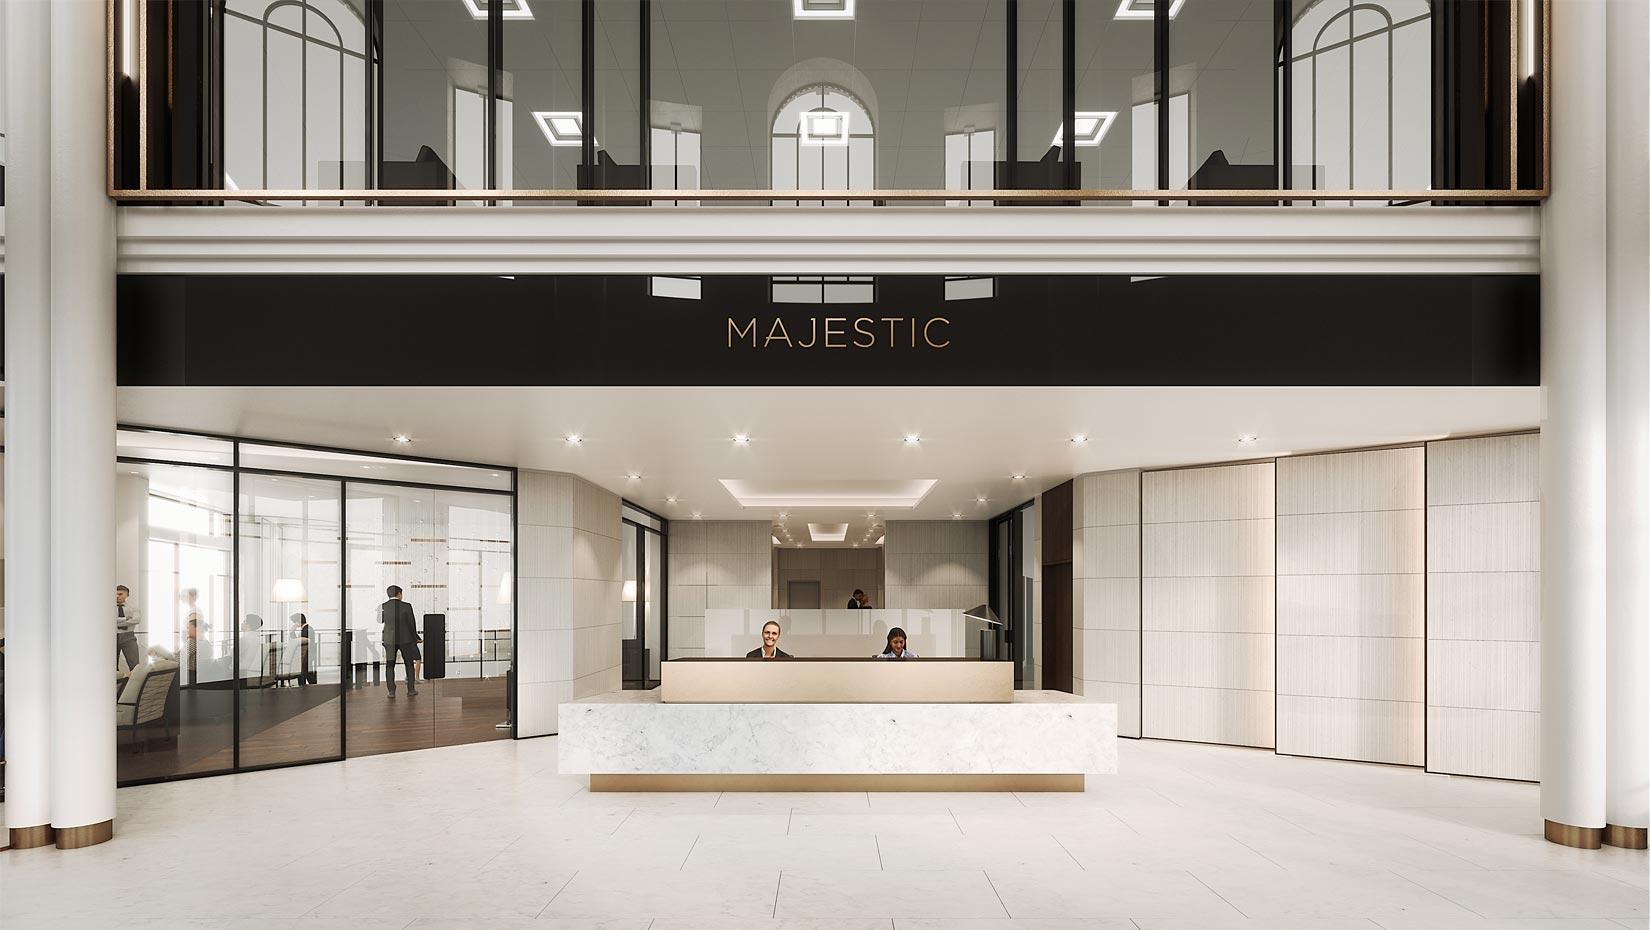 The Majestic, Leeds, reception visual, Image © RIOT CGI Ltd